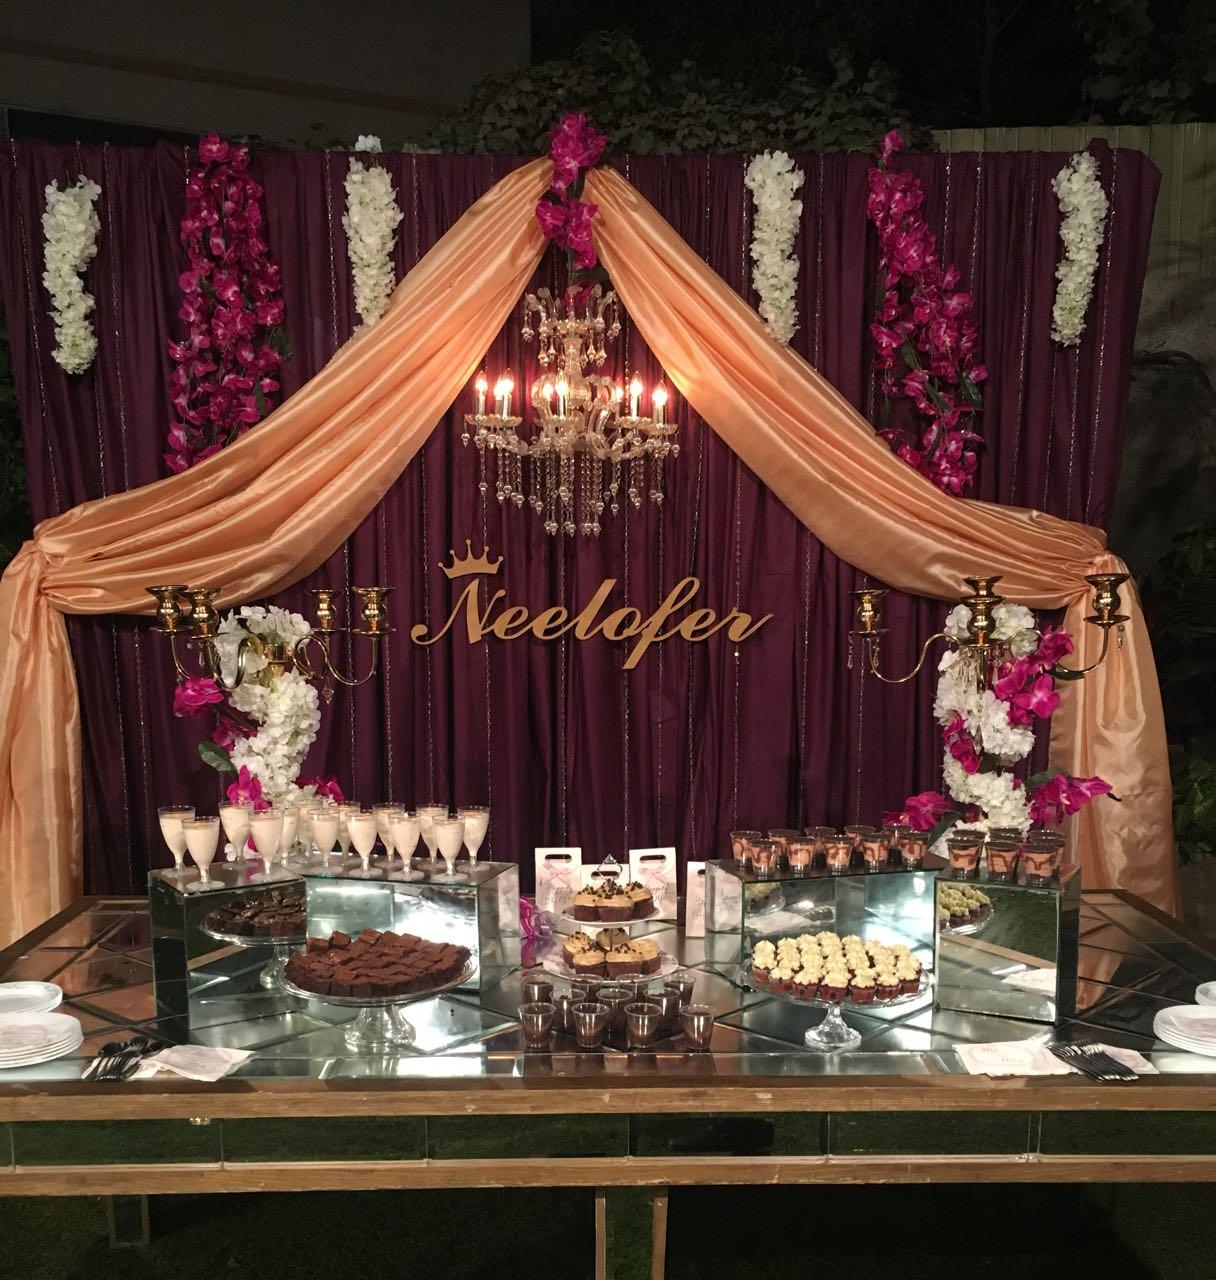 Dessert Table and decor 1